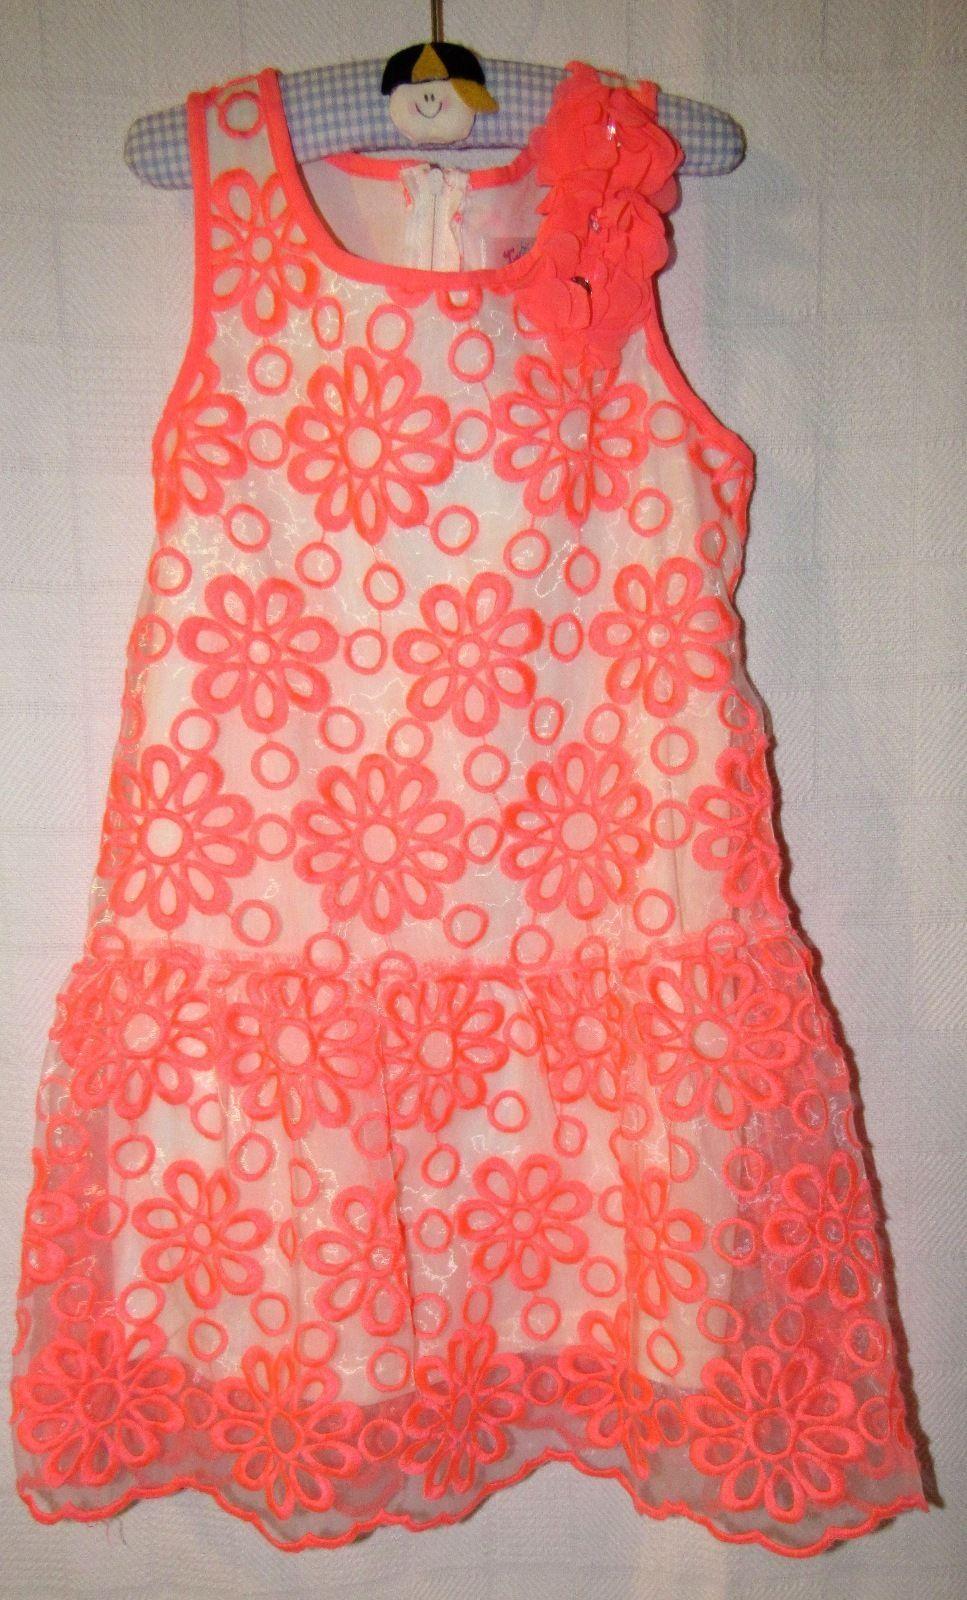 TWEEN BRAND/Justice Girls Embroidered Flower Dress - Girls Size: 6